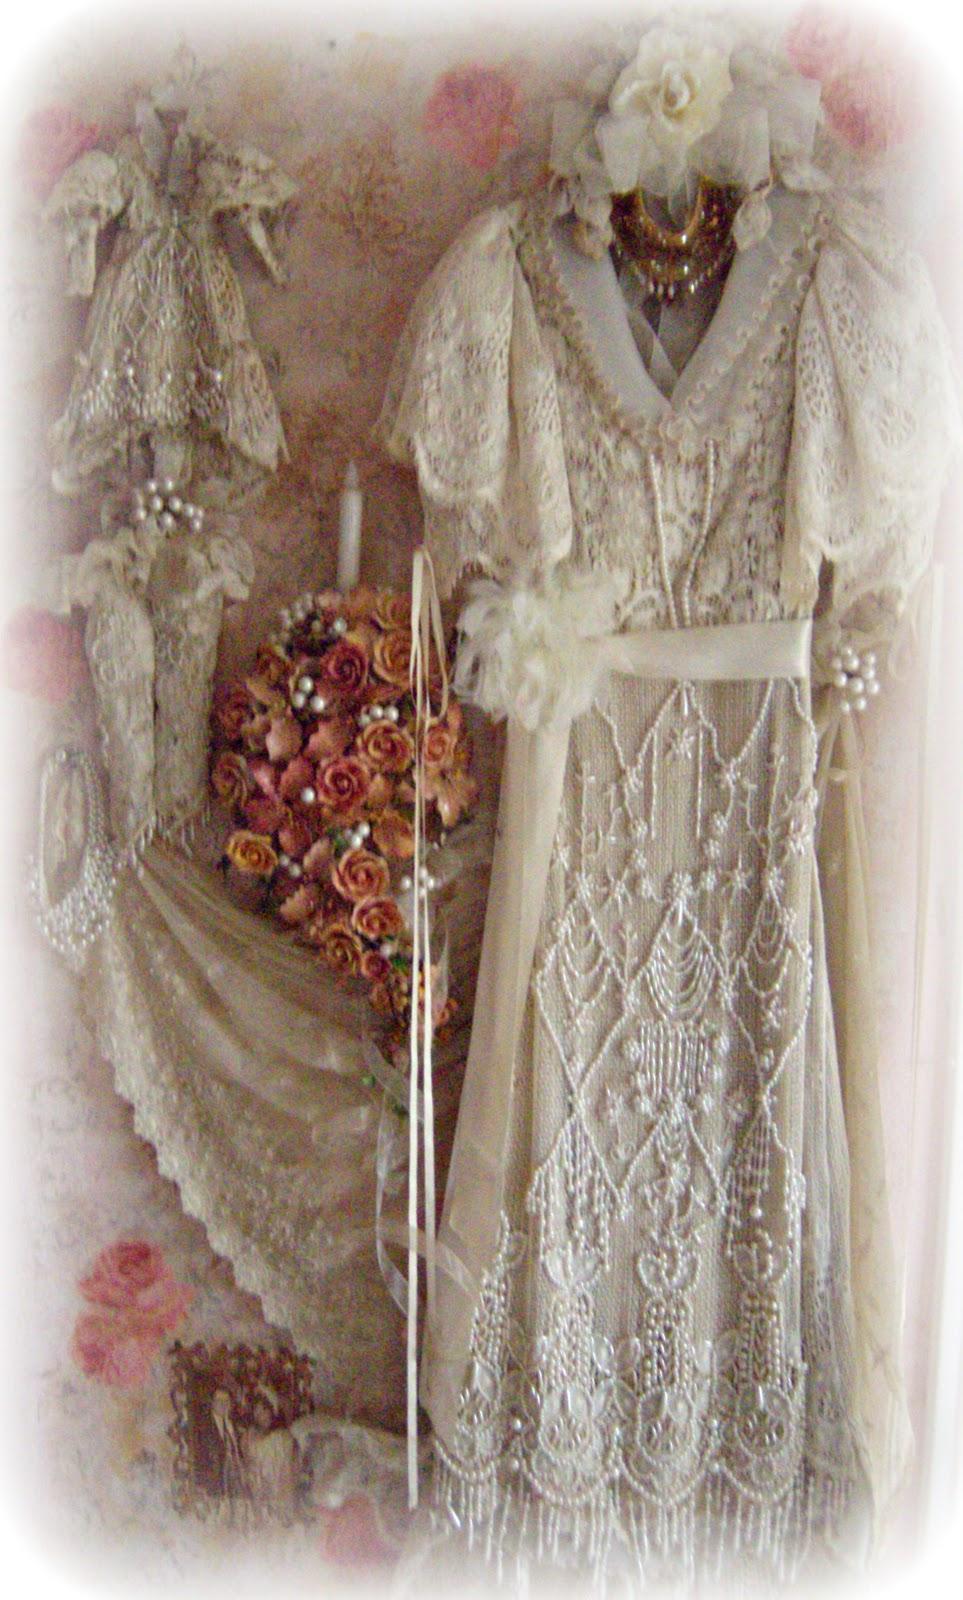 Suzy Homefaker: VINTAGE WEDDING DRESS SHADOW BOX